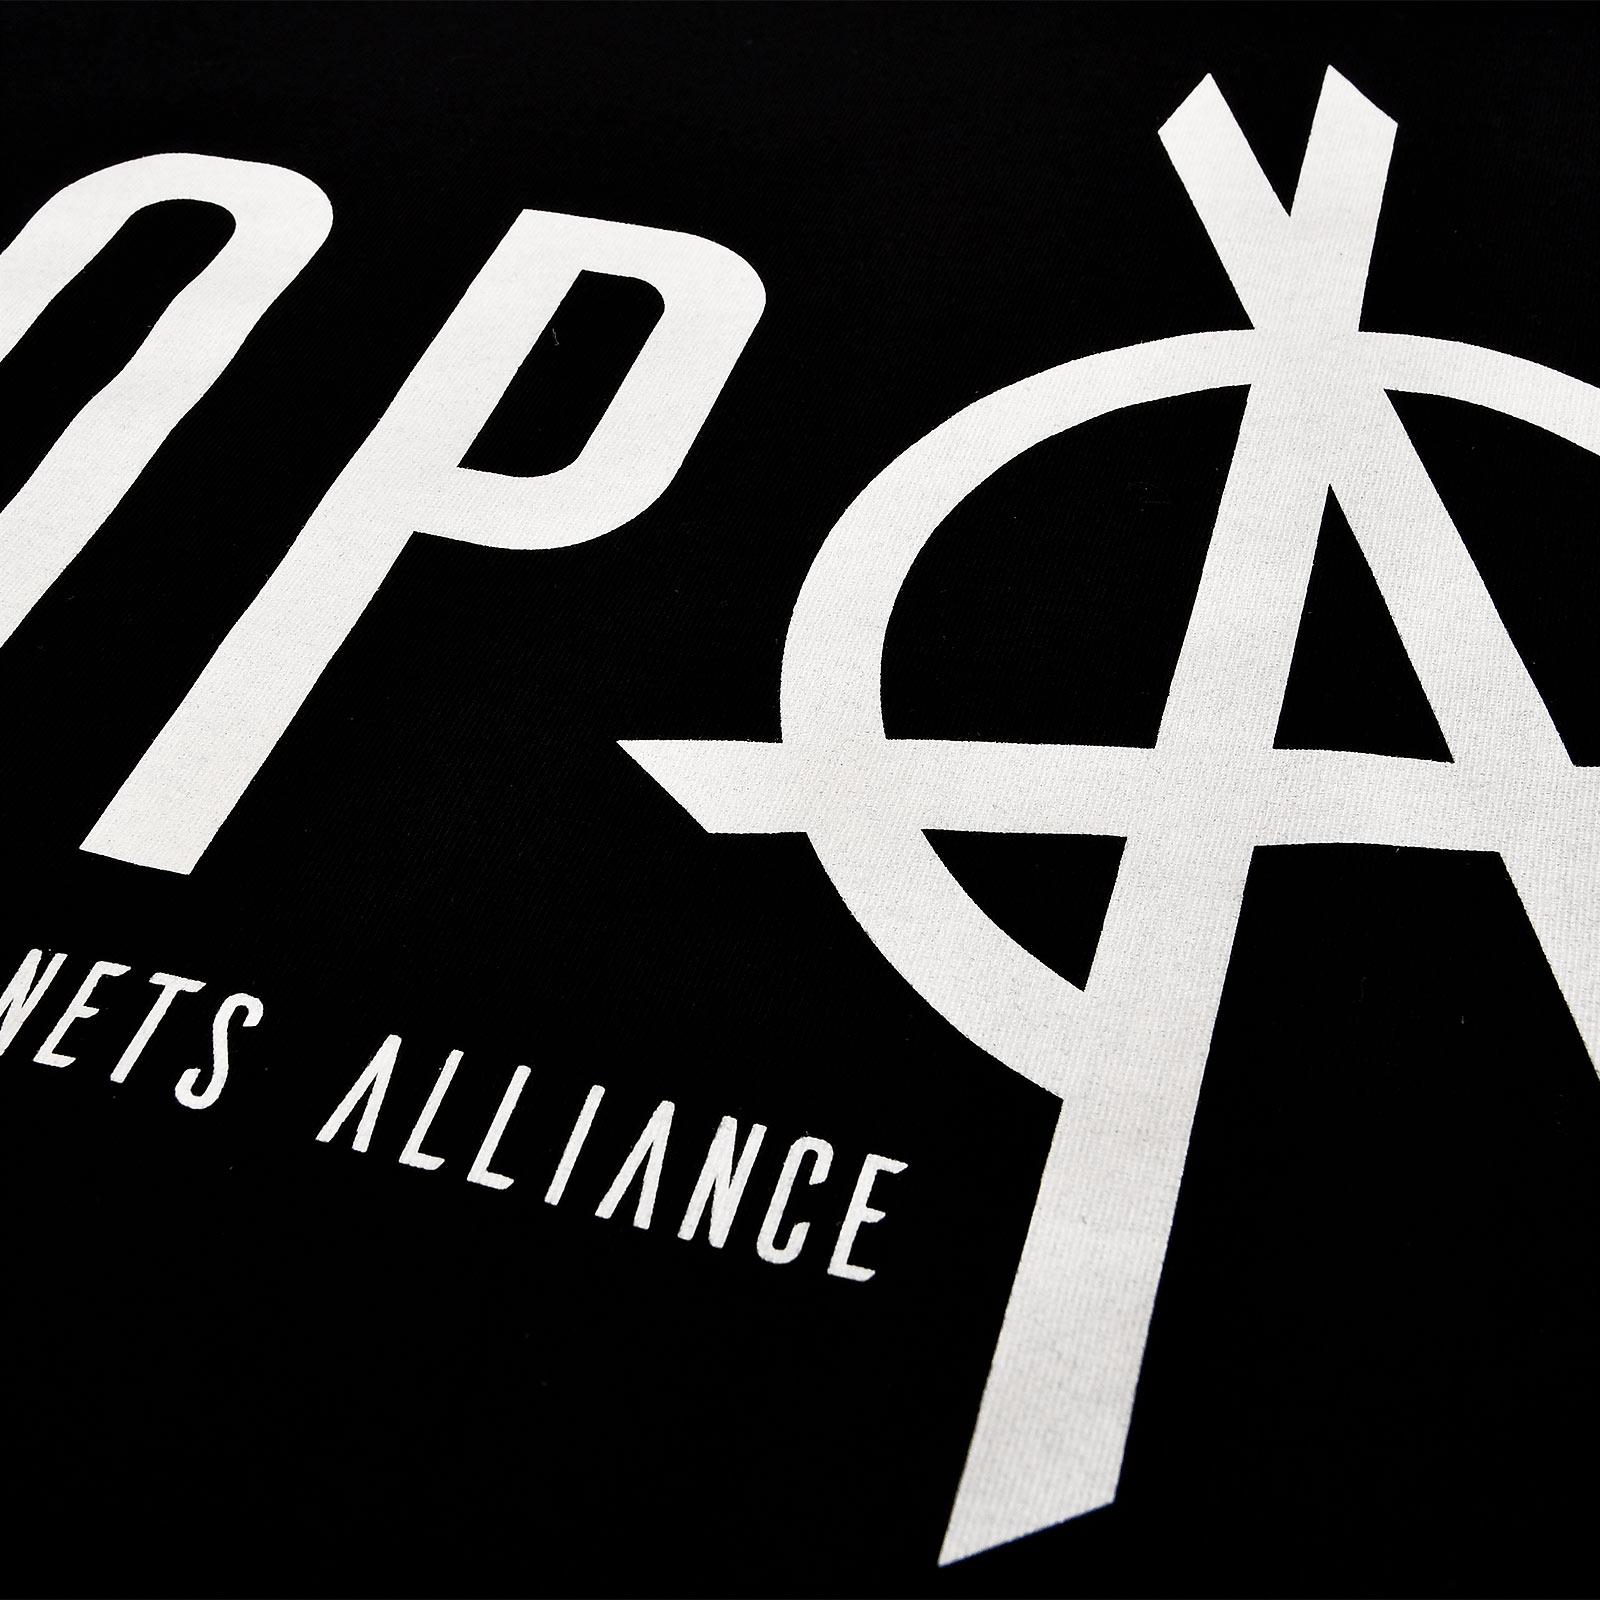 Outer Planets Alliance Logo T-Shirt für The Expanse Fans schwarz